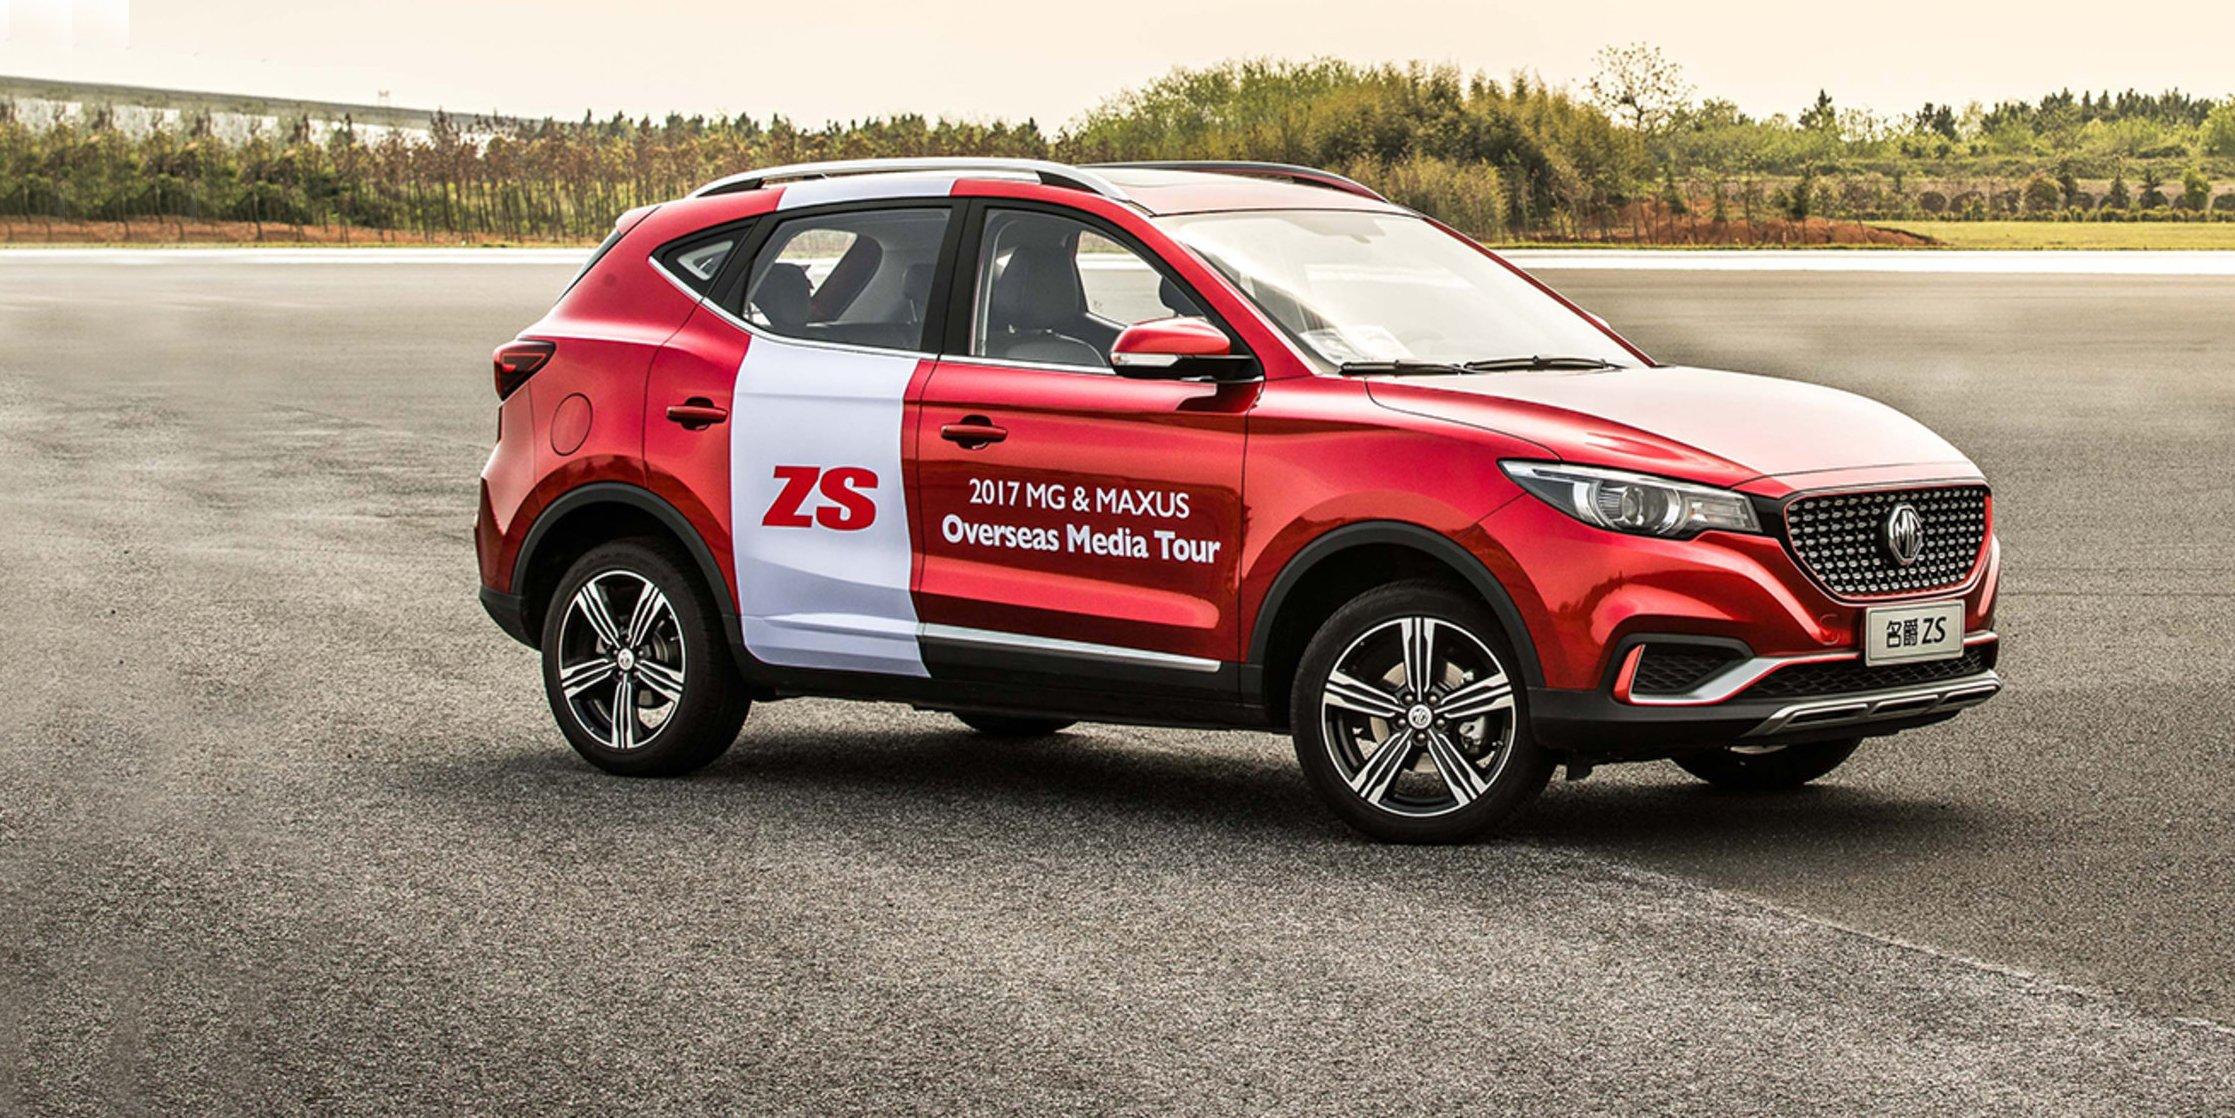 2018 MG ZS review: Quick drive - photos | CarAdvice